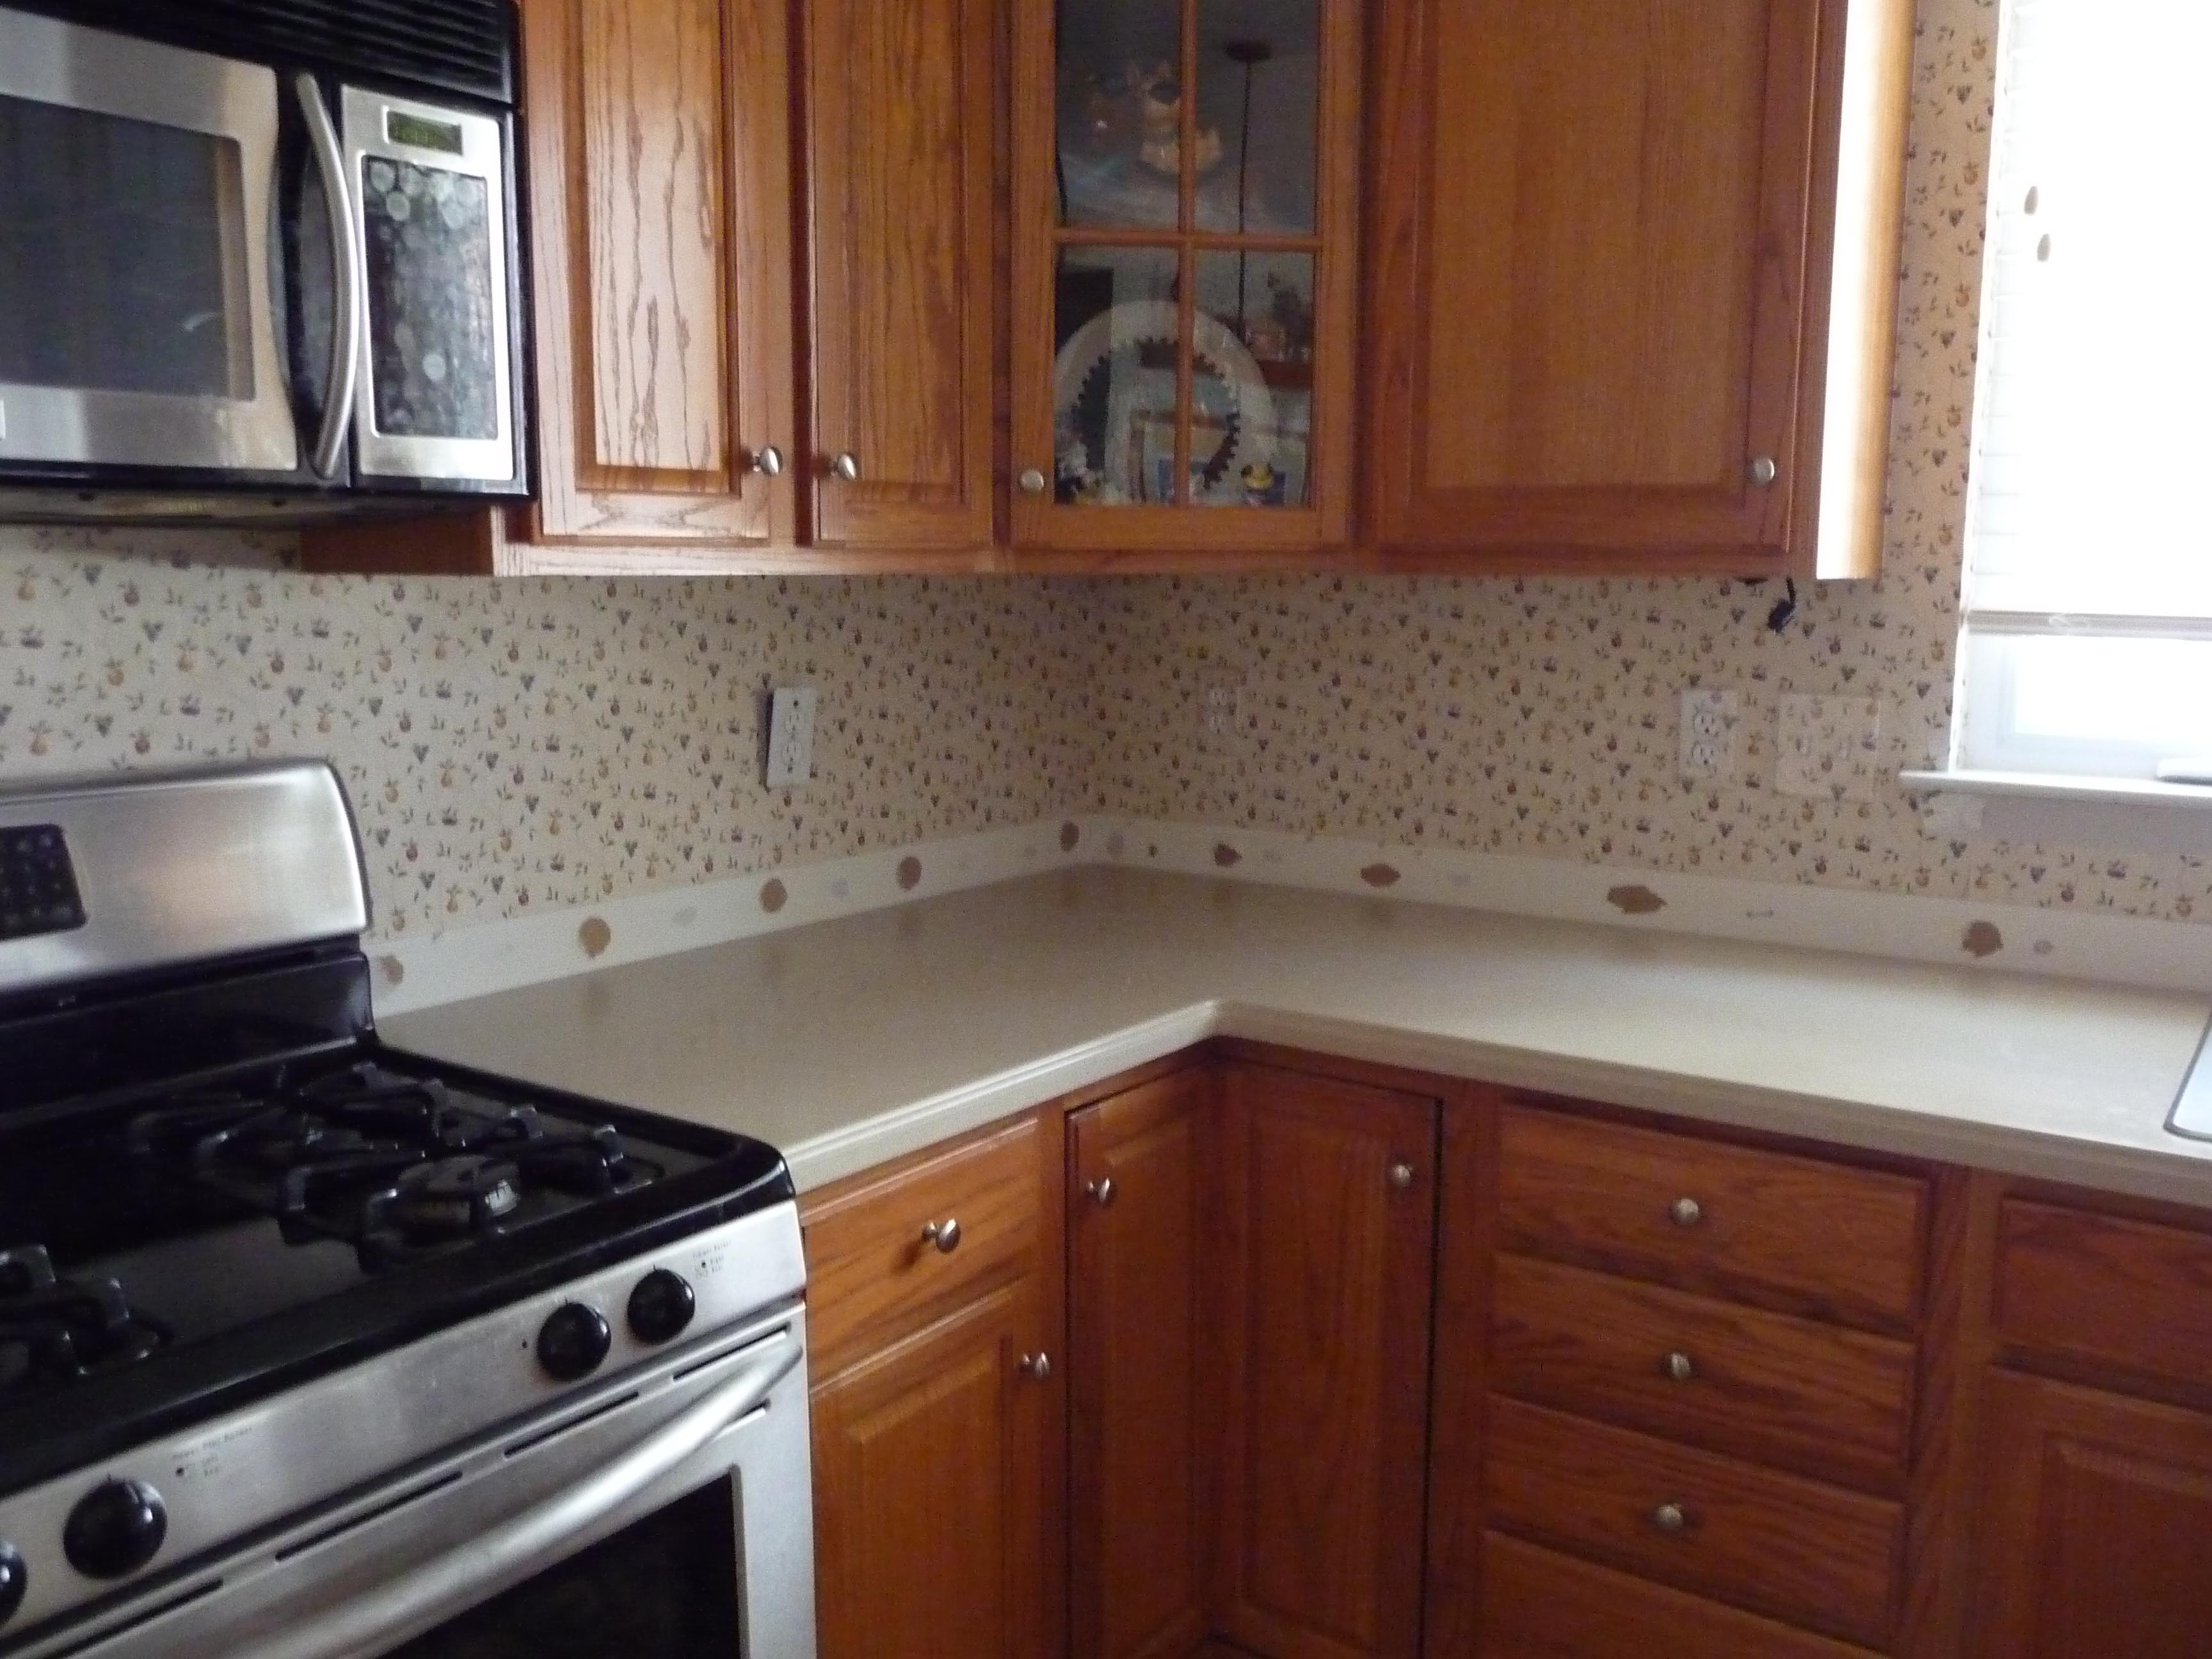 tile wallpaper backsplash stone backsplash kitchen new kitchen backsplash with decorative stone before picture